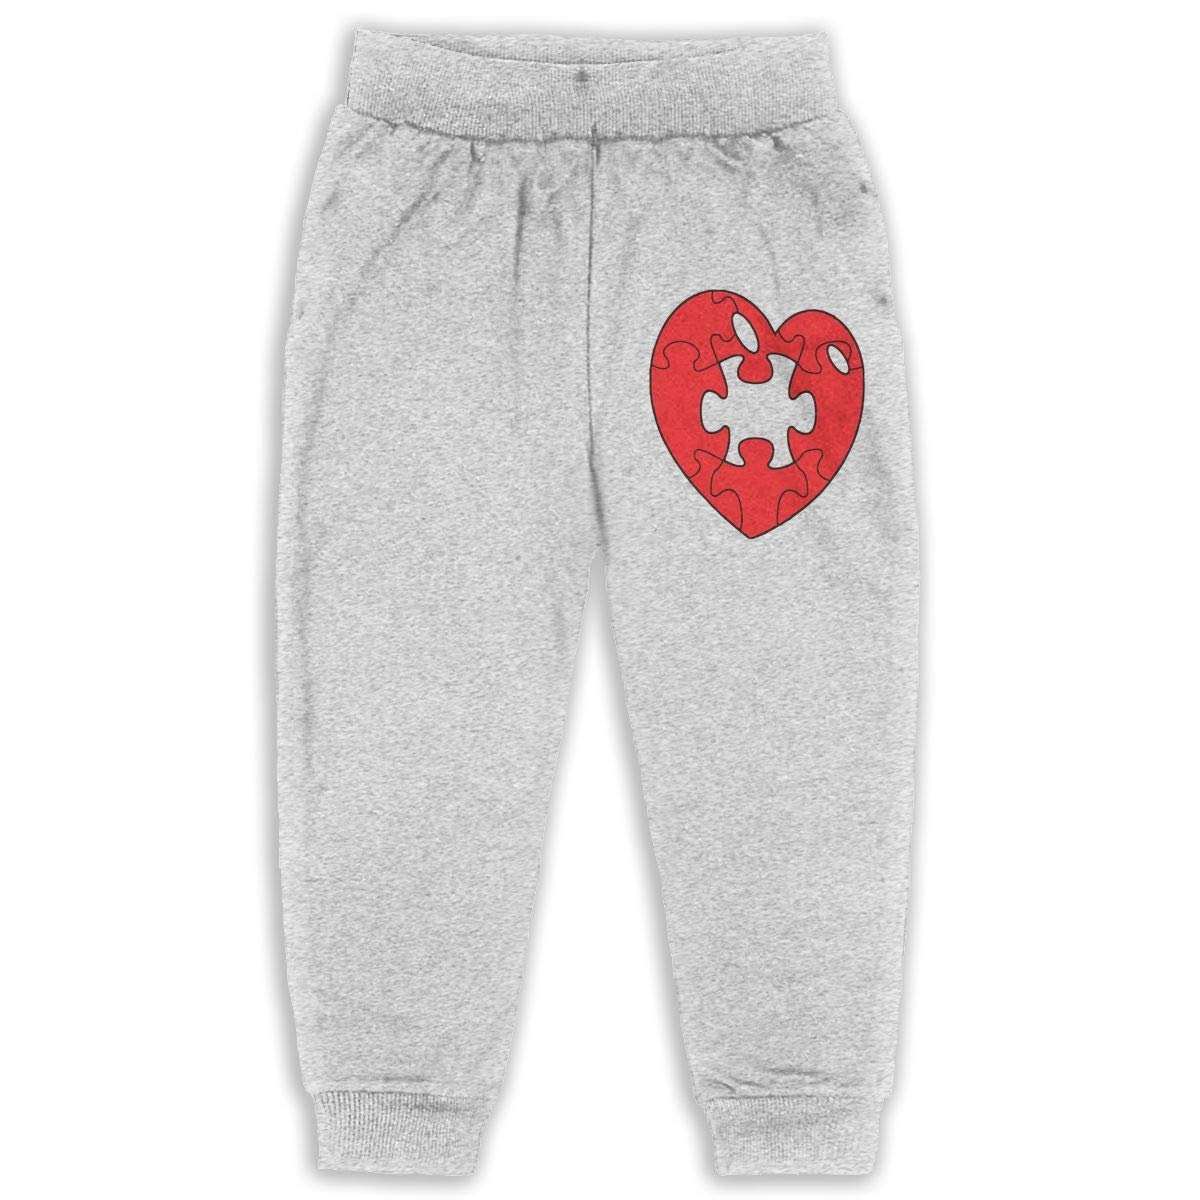 Soft Cozy Boys /& Girls Elastic Trousers Love Autism Awareness Puzzle Unisex Kid Toddler Sweatpants